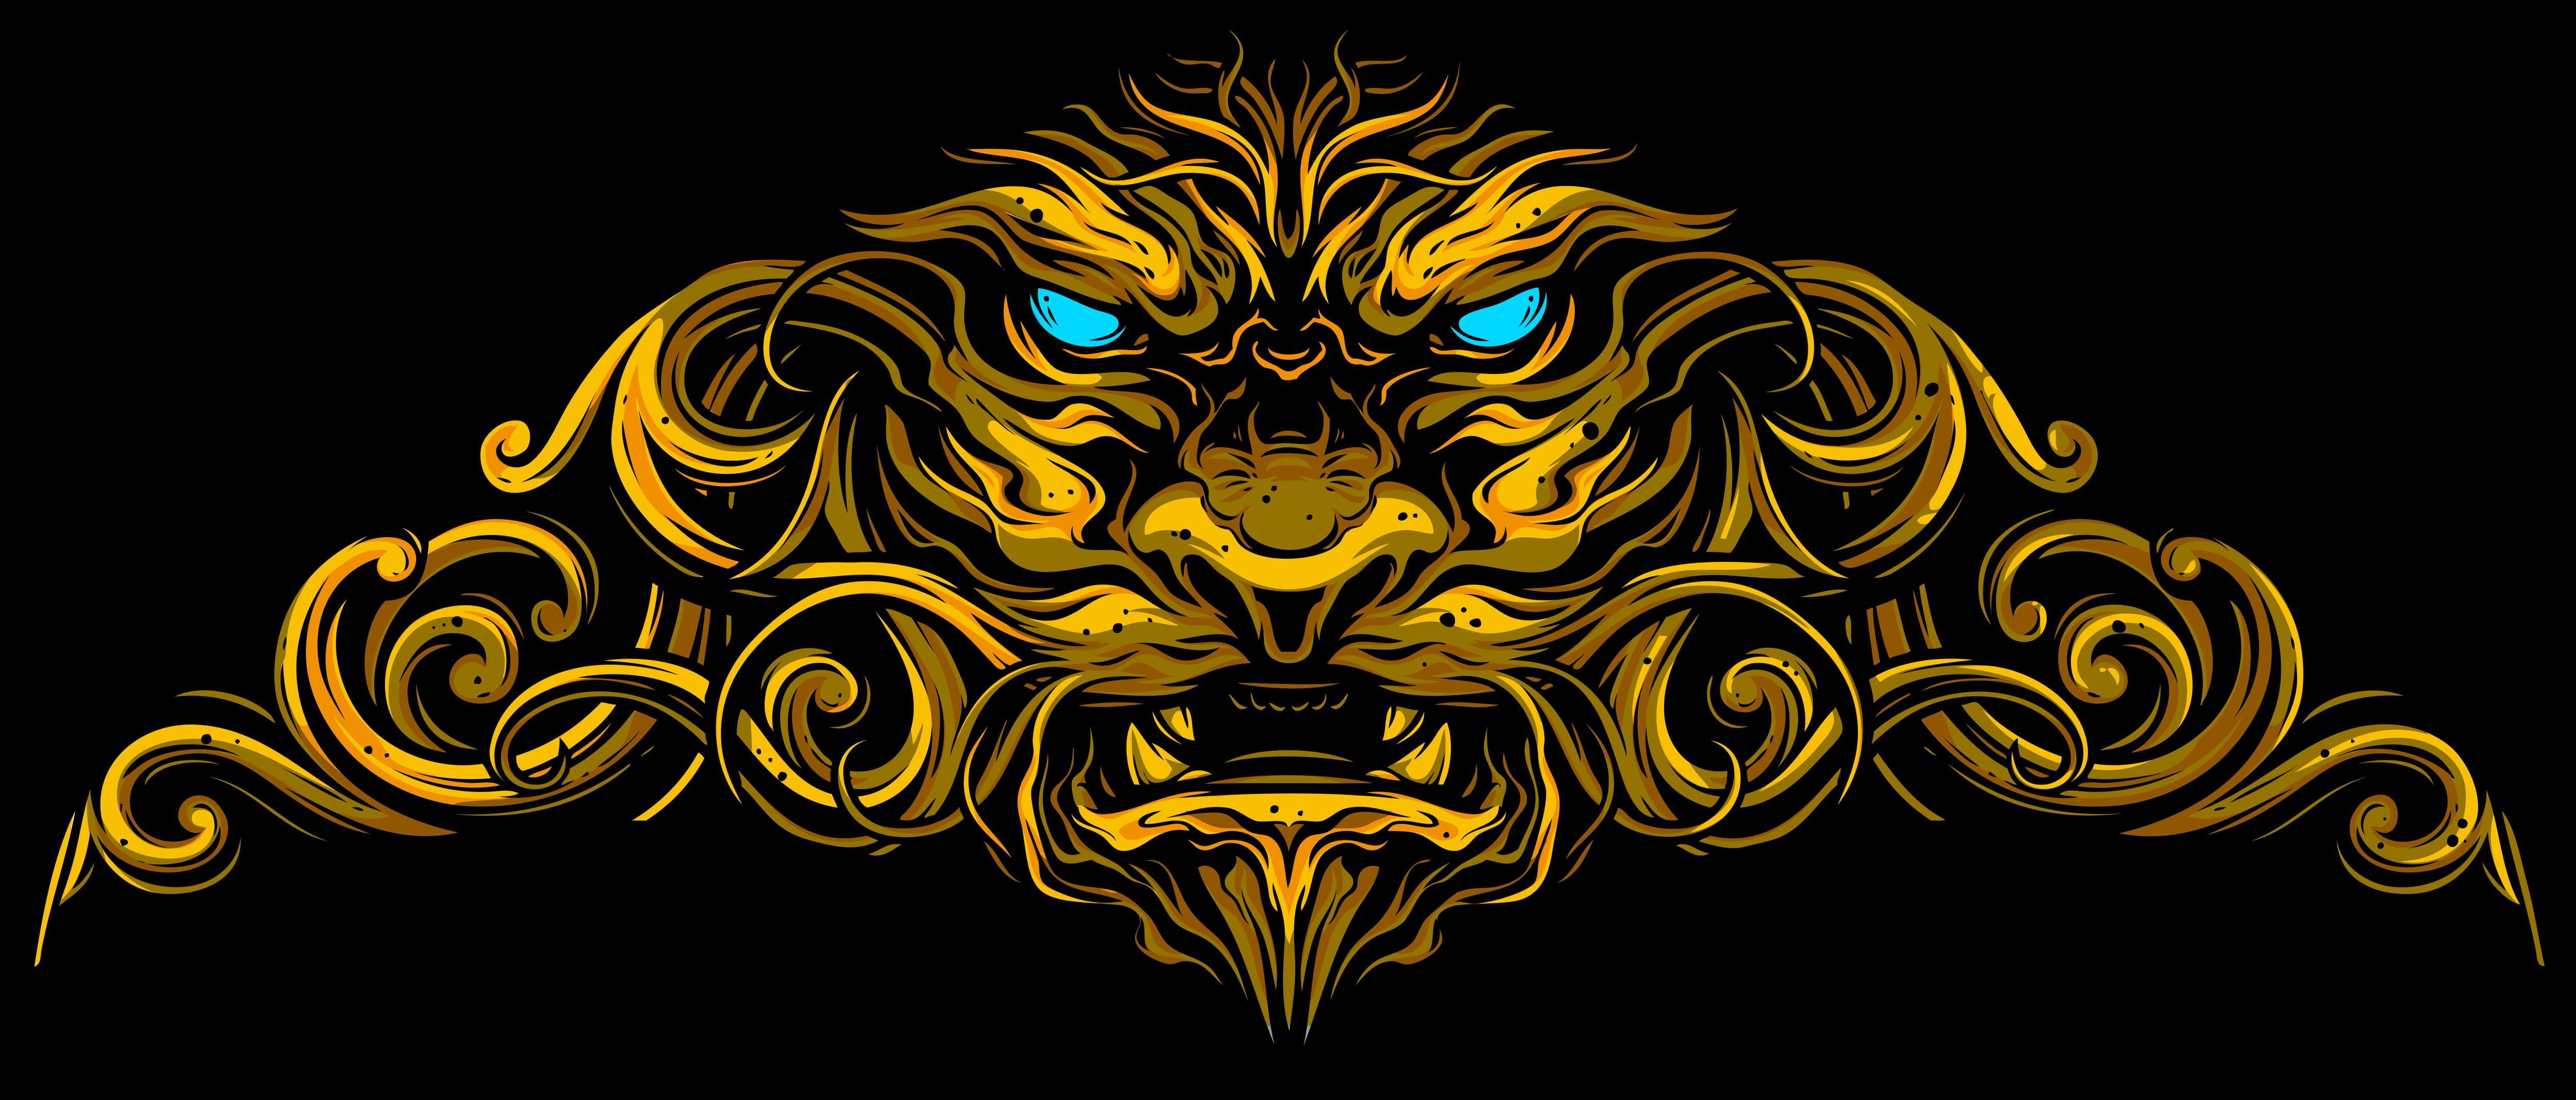 Lion Tattoo Design - Main